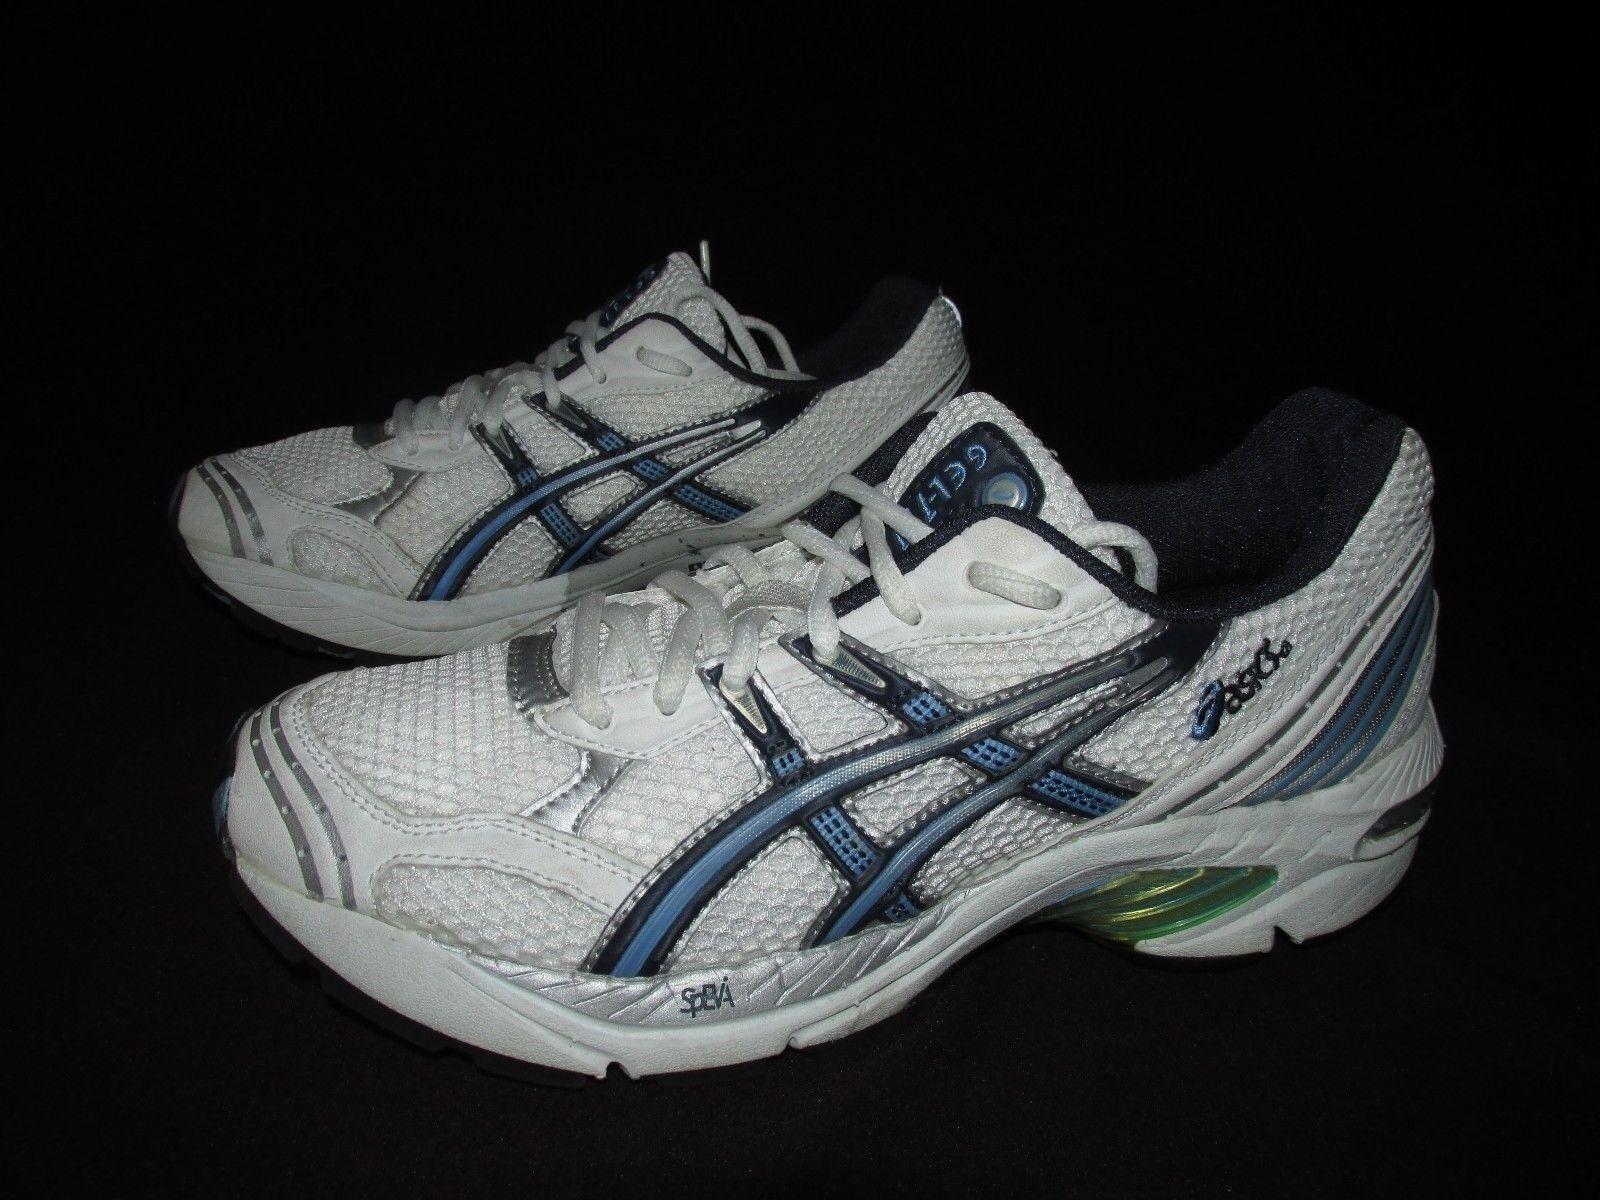 ASCIS Duomax Gel1110  blanc  bleu Synthetic Mesh Running Training  Chaussures  femmes  8M